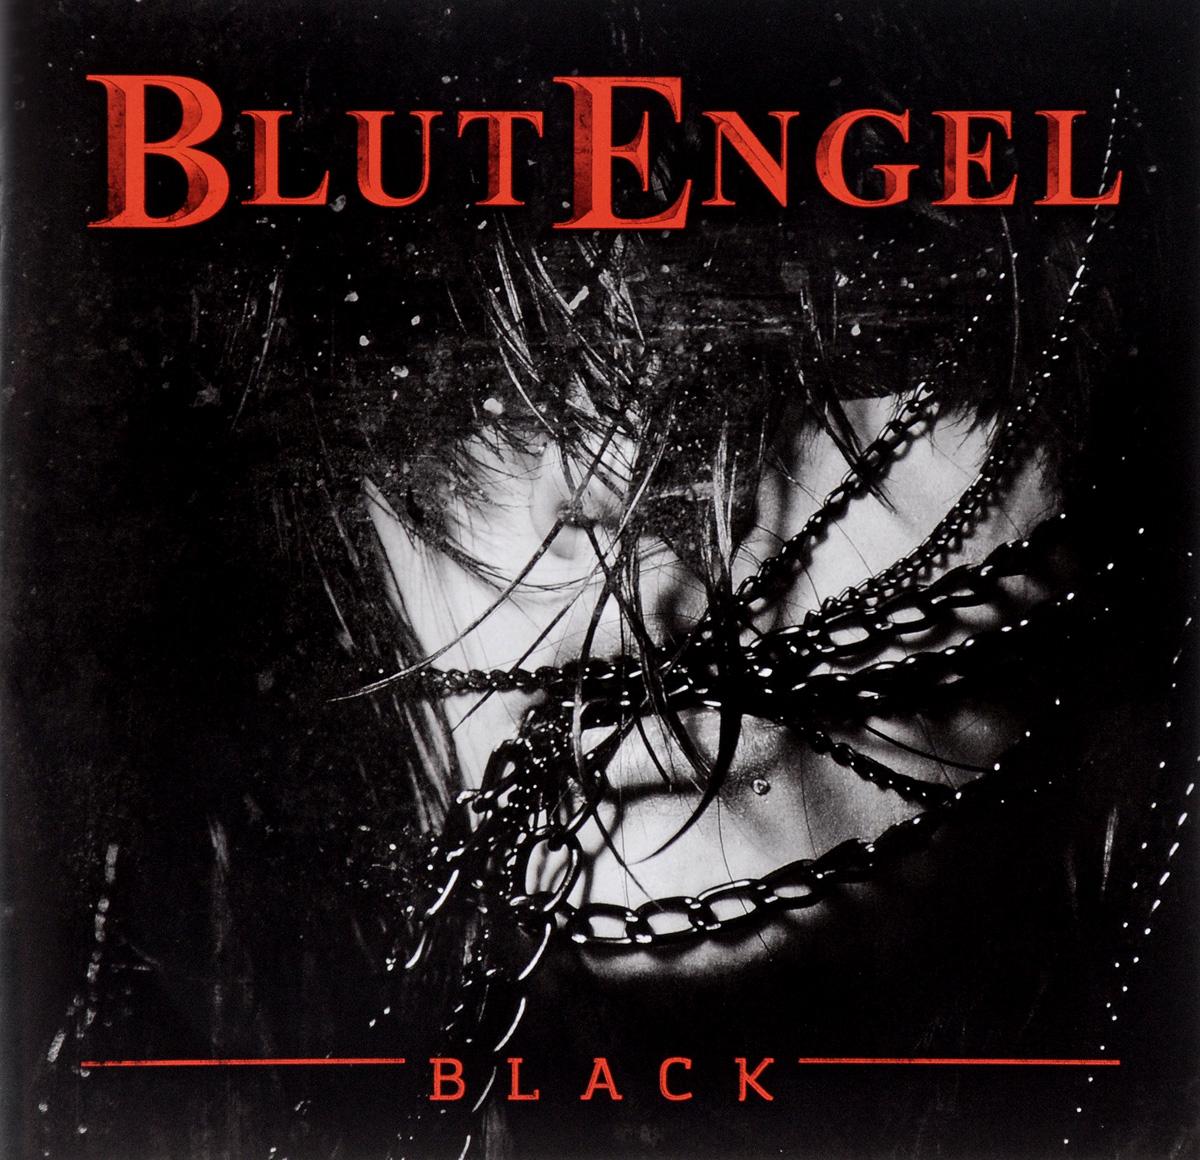 Blutengel. Black